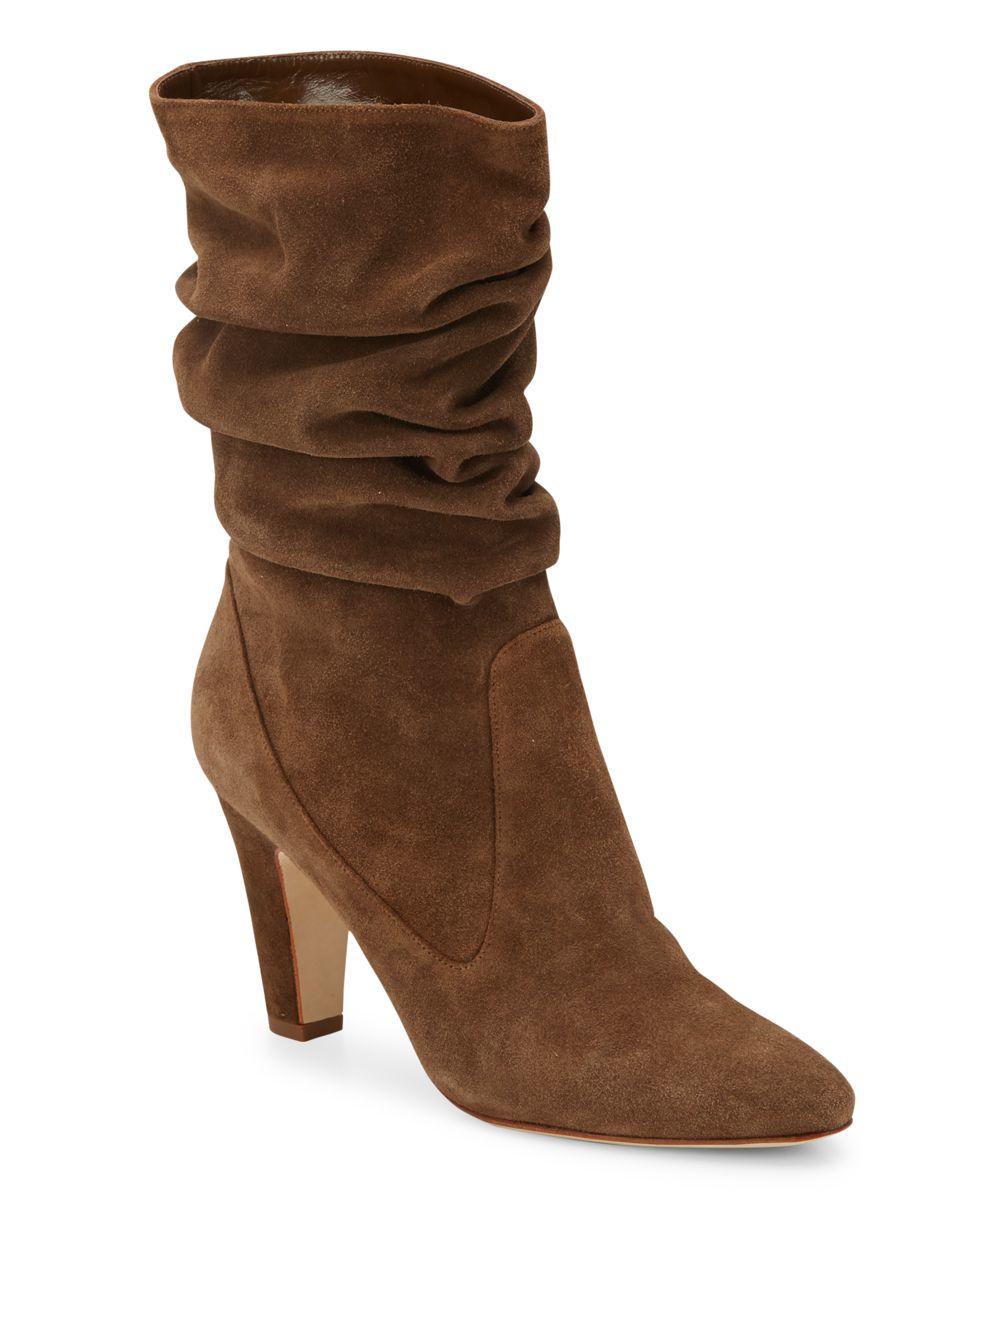 manolo blahnik artesina suede slouchy mid calf boots in